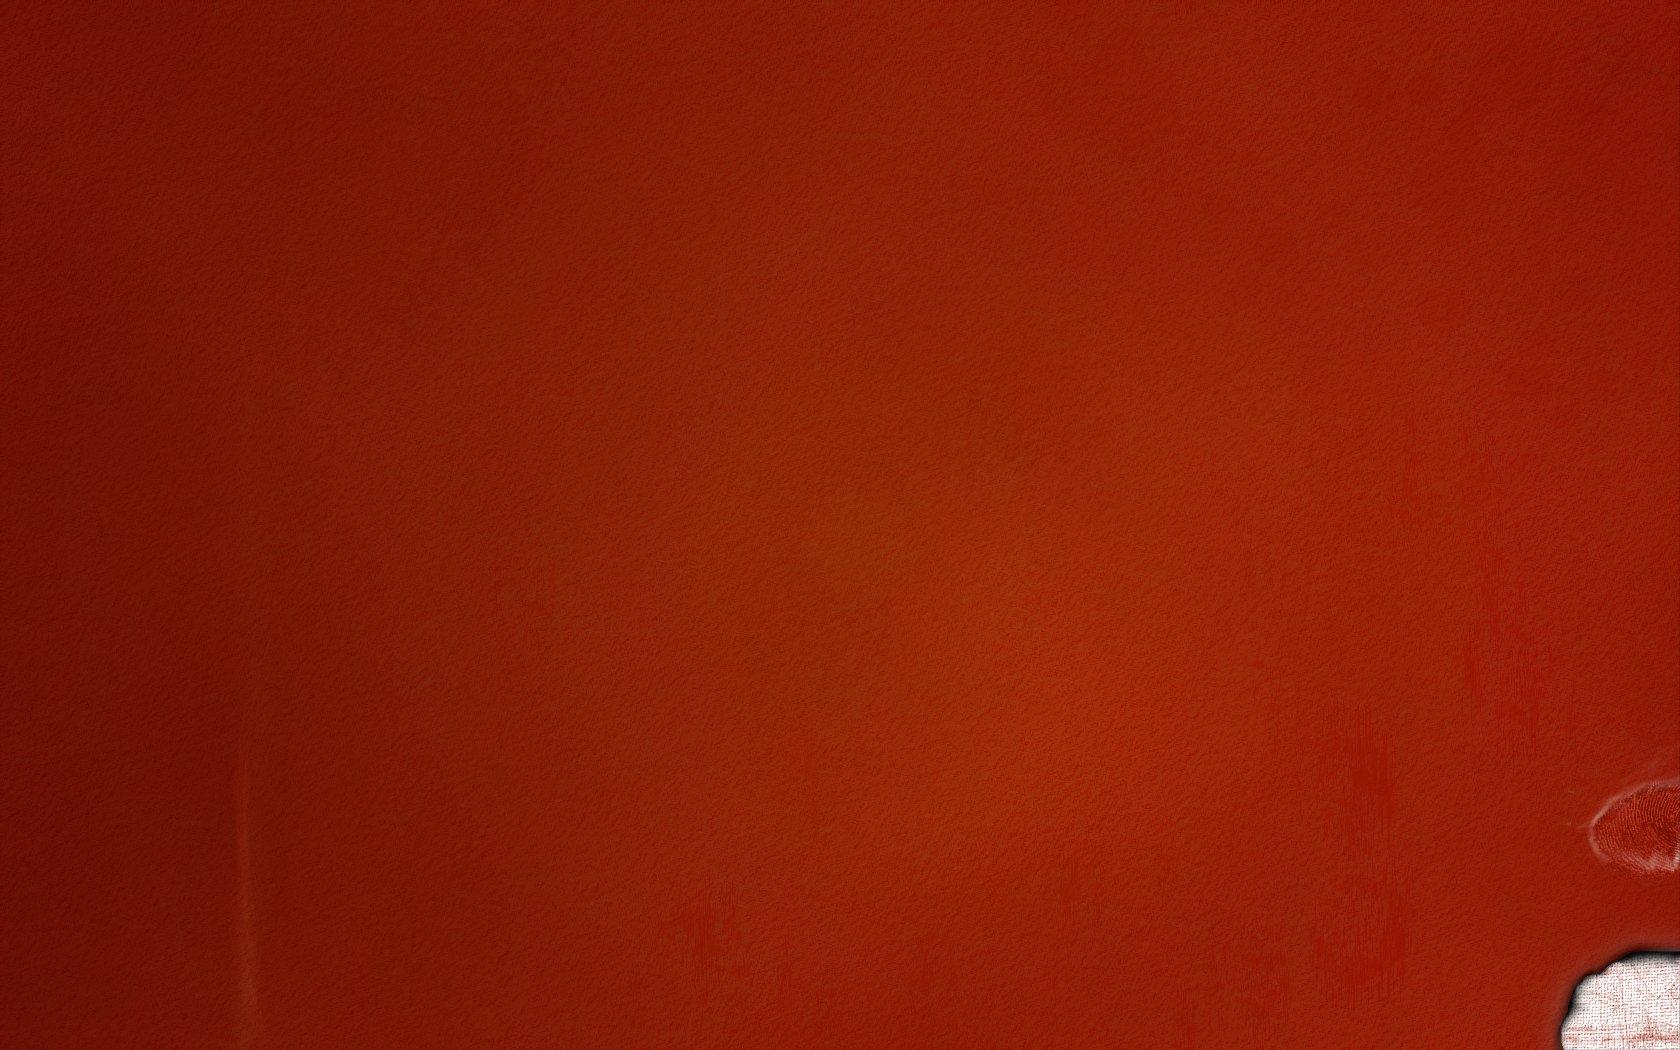 grunge corner orange